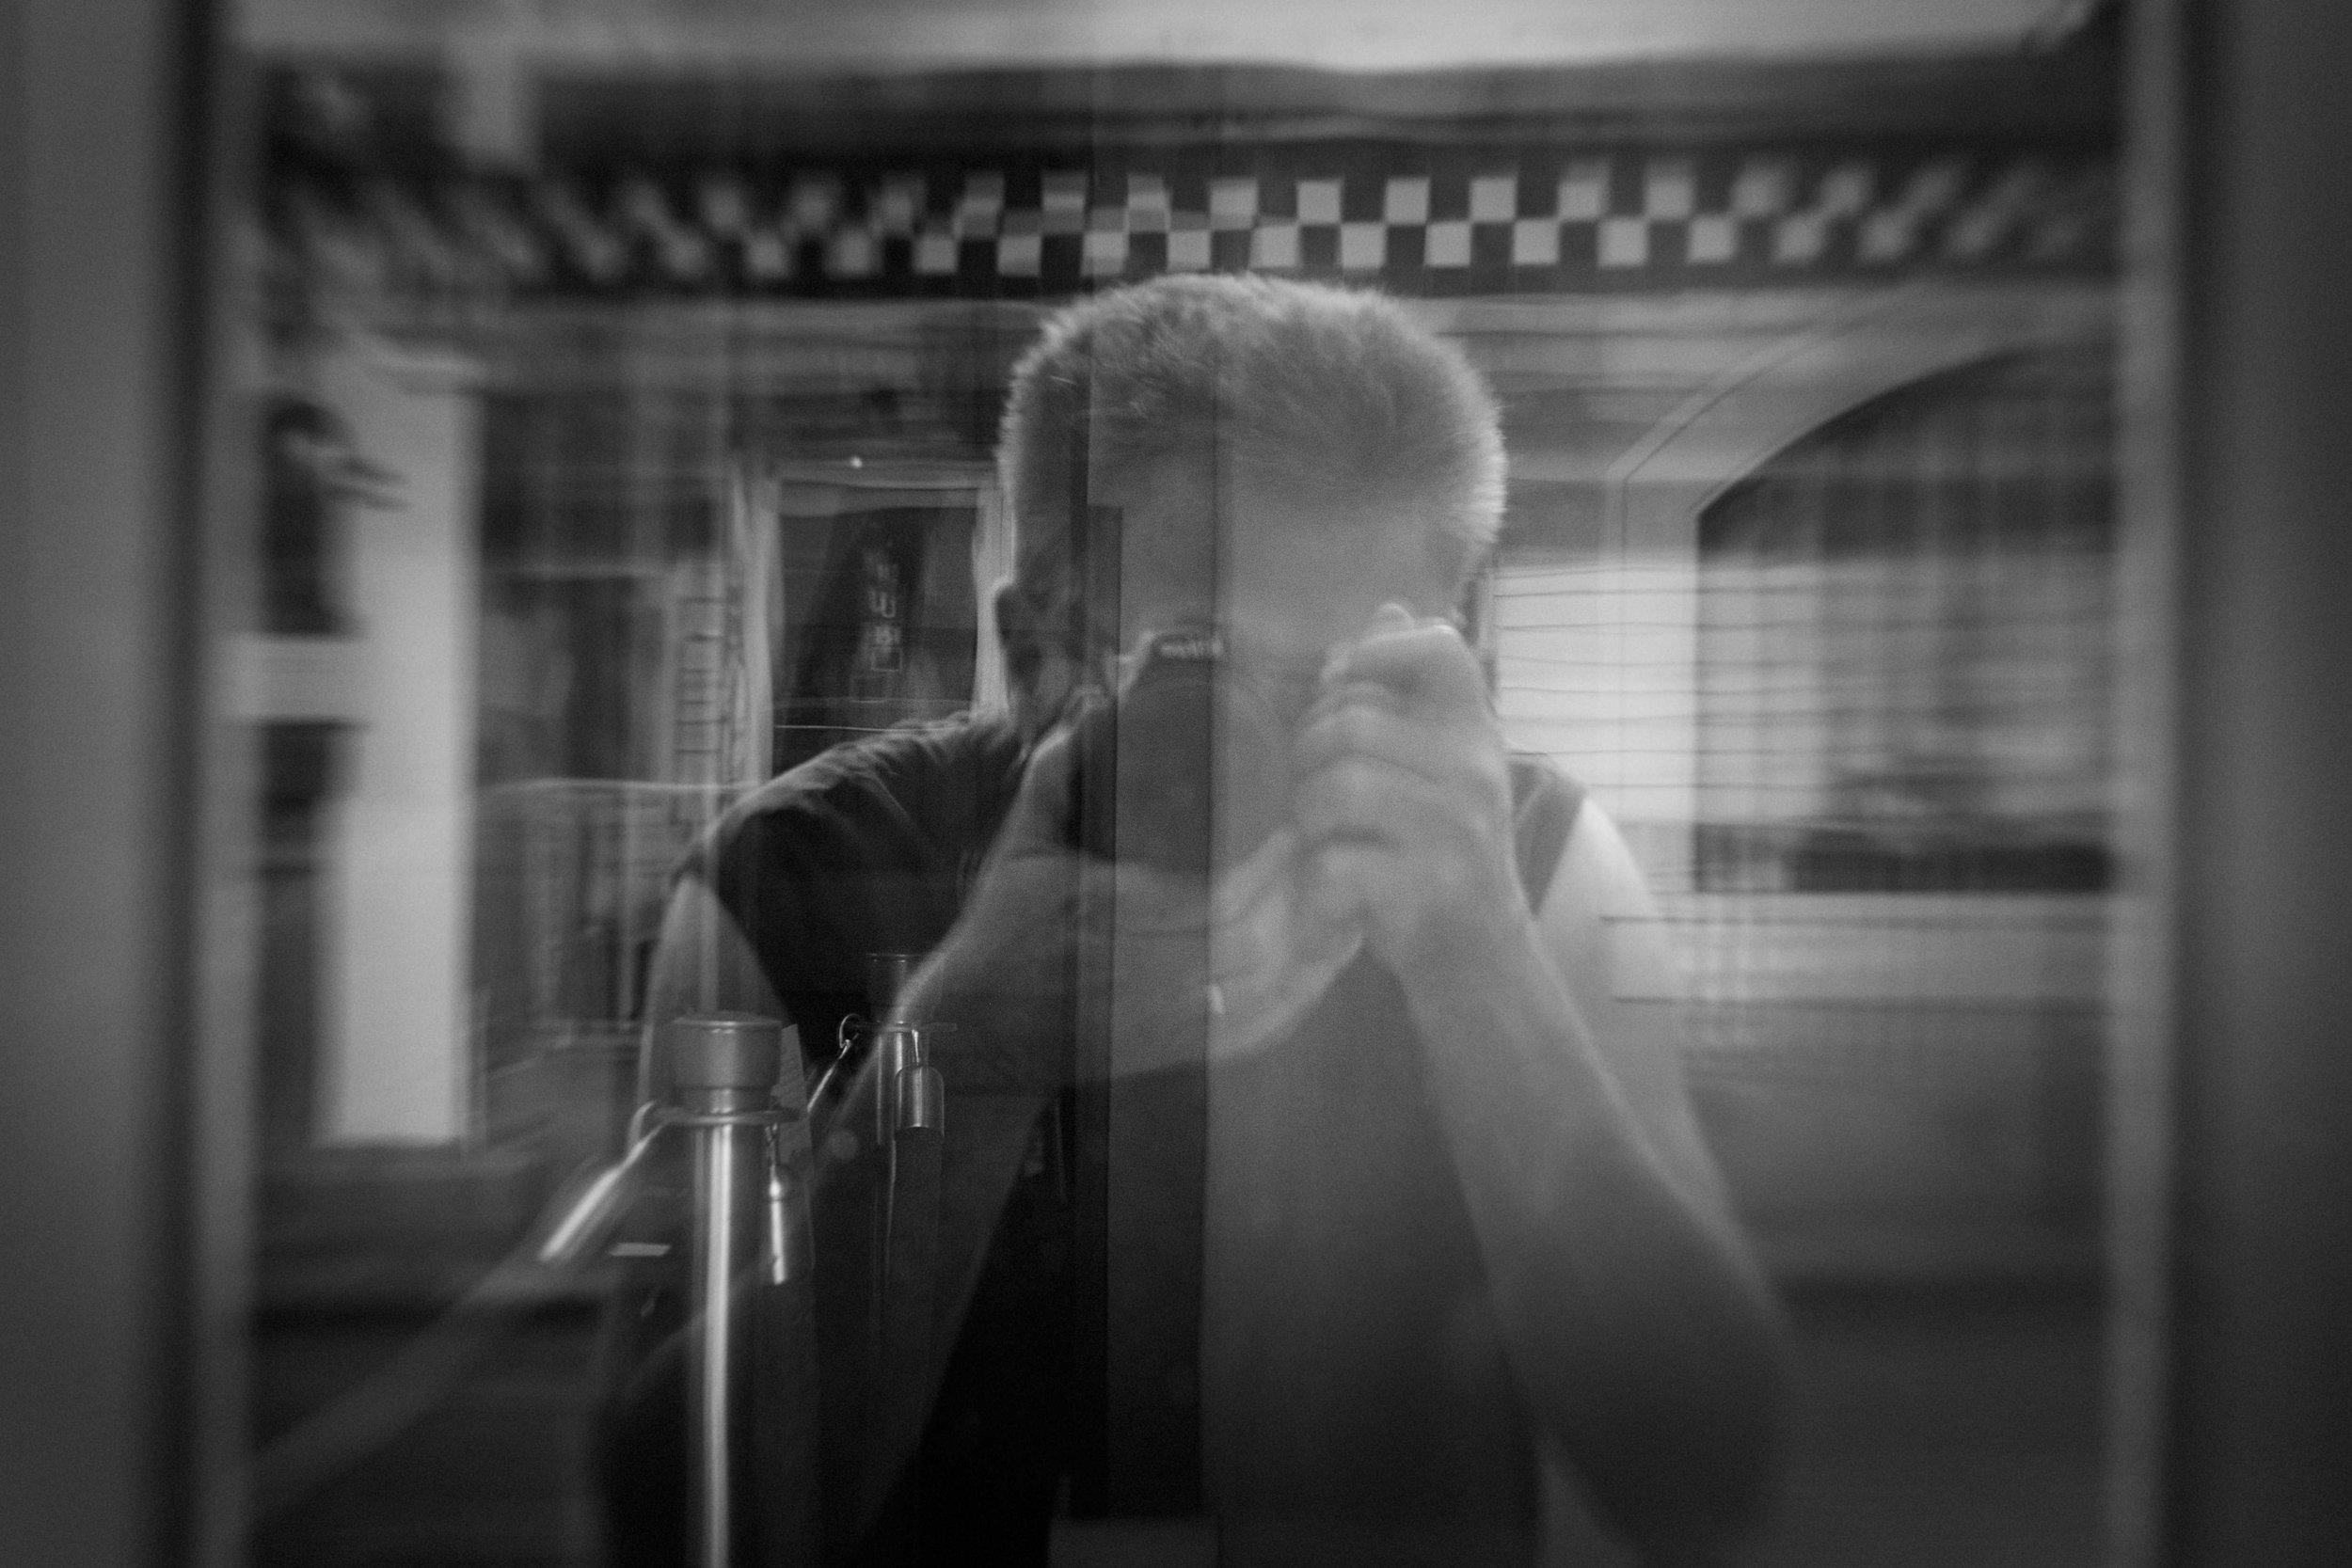 2017 Self Portrait